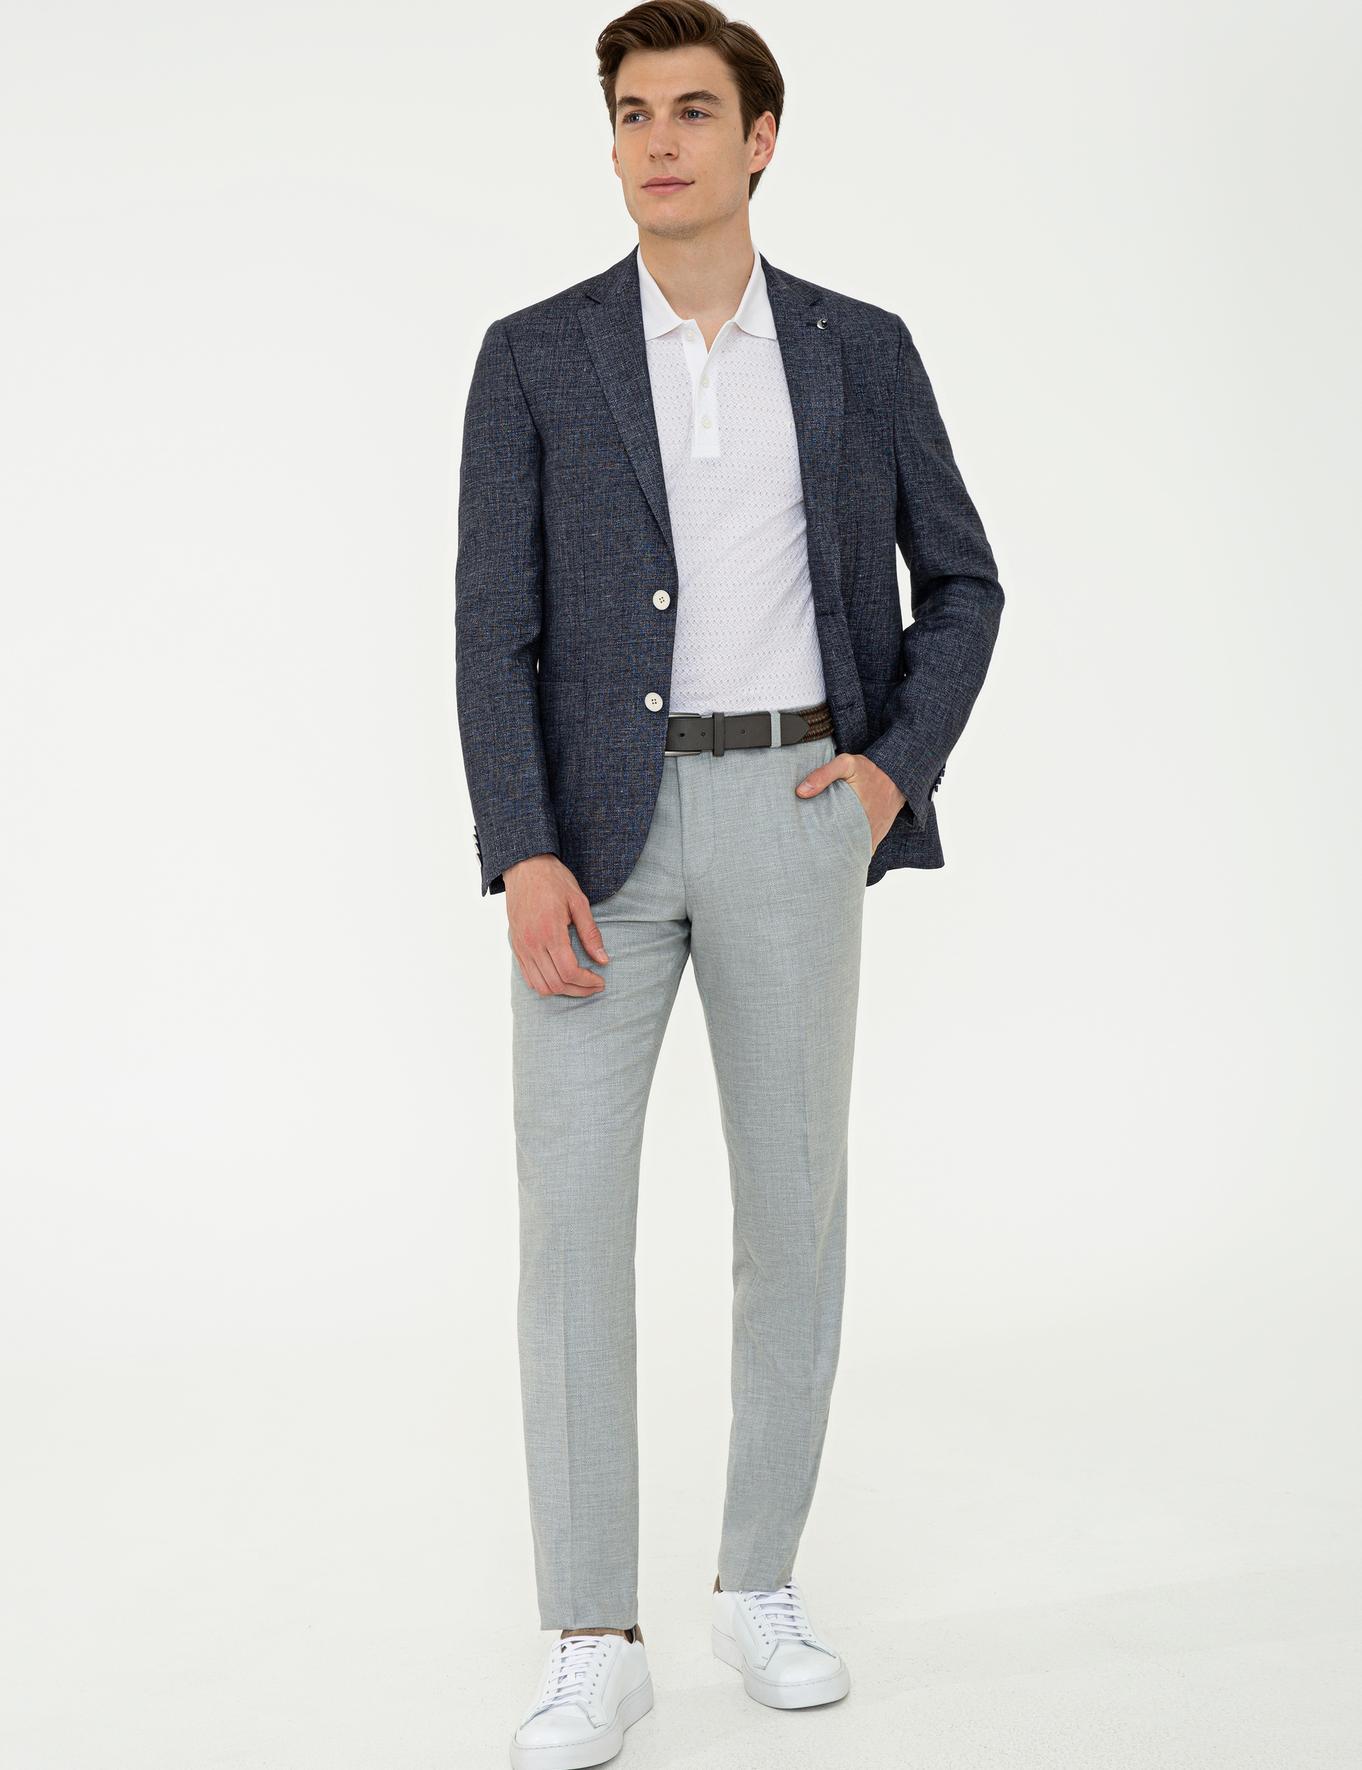 Lacivert Slim Fit Ceket - 50233107014